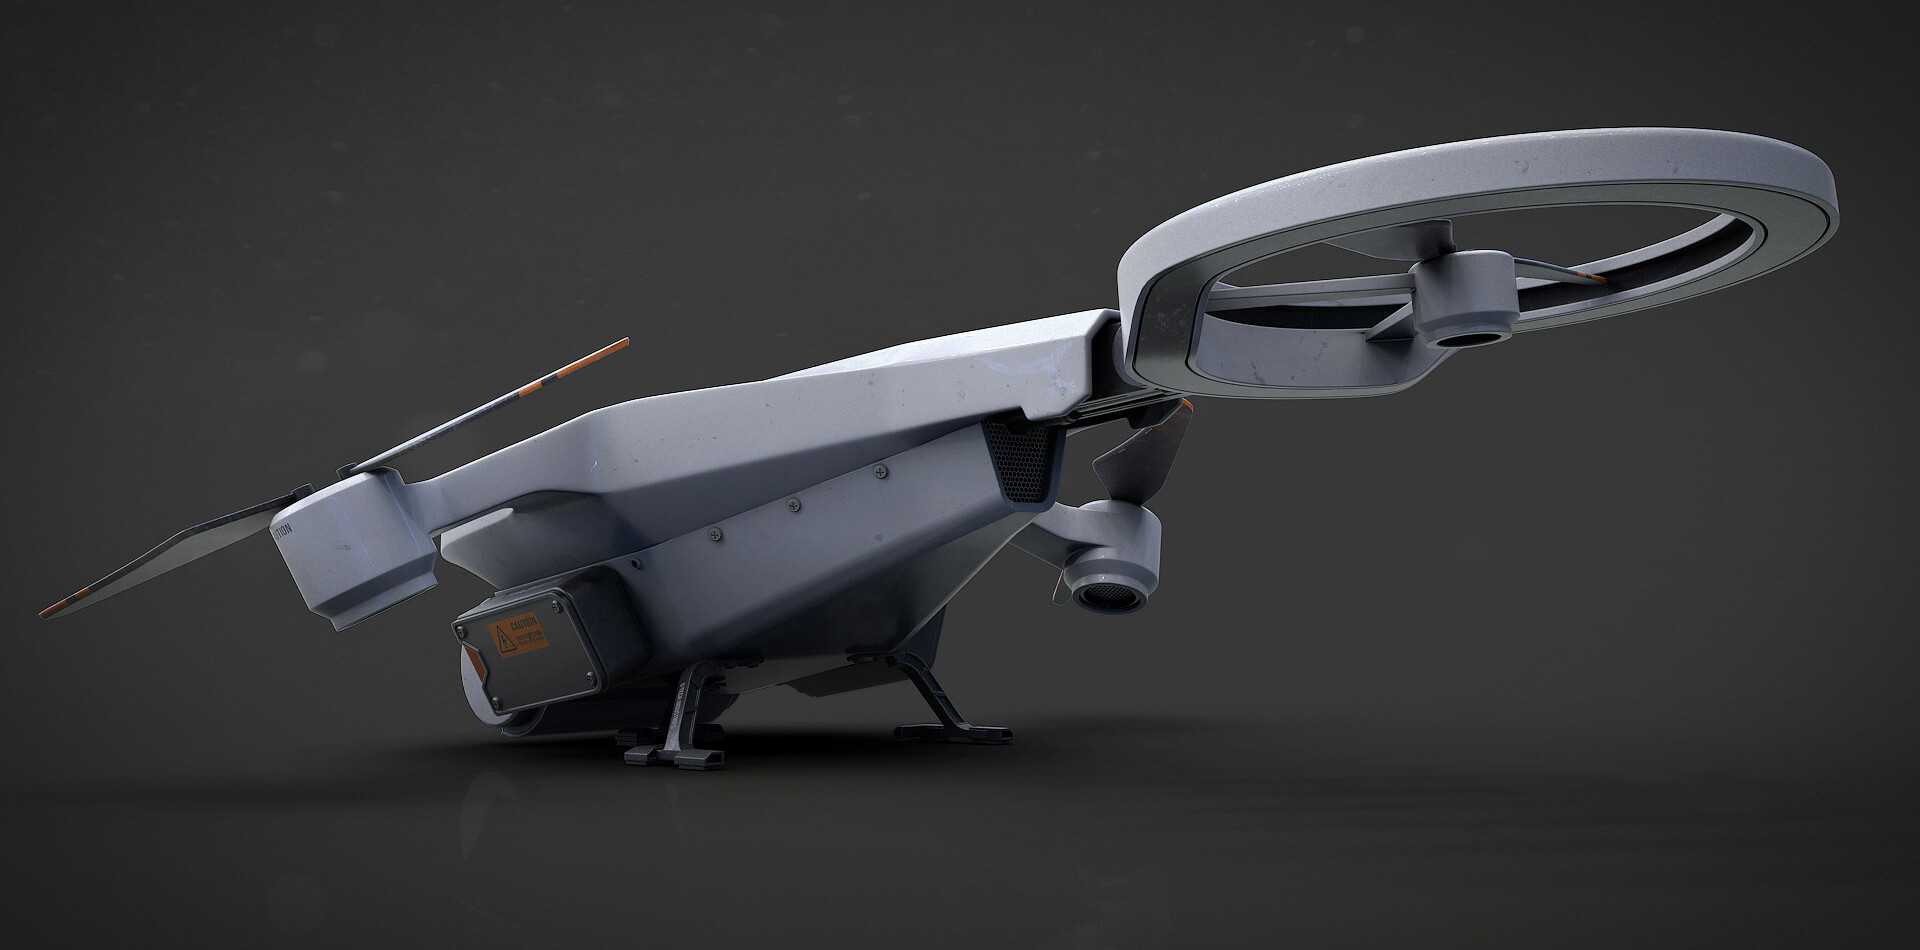 Mathew o drone 4